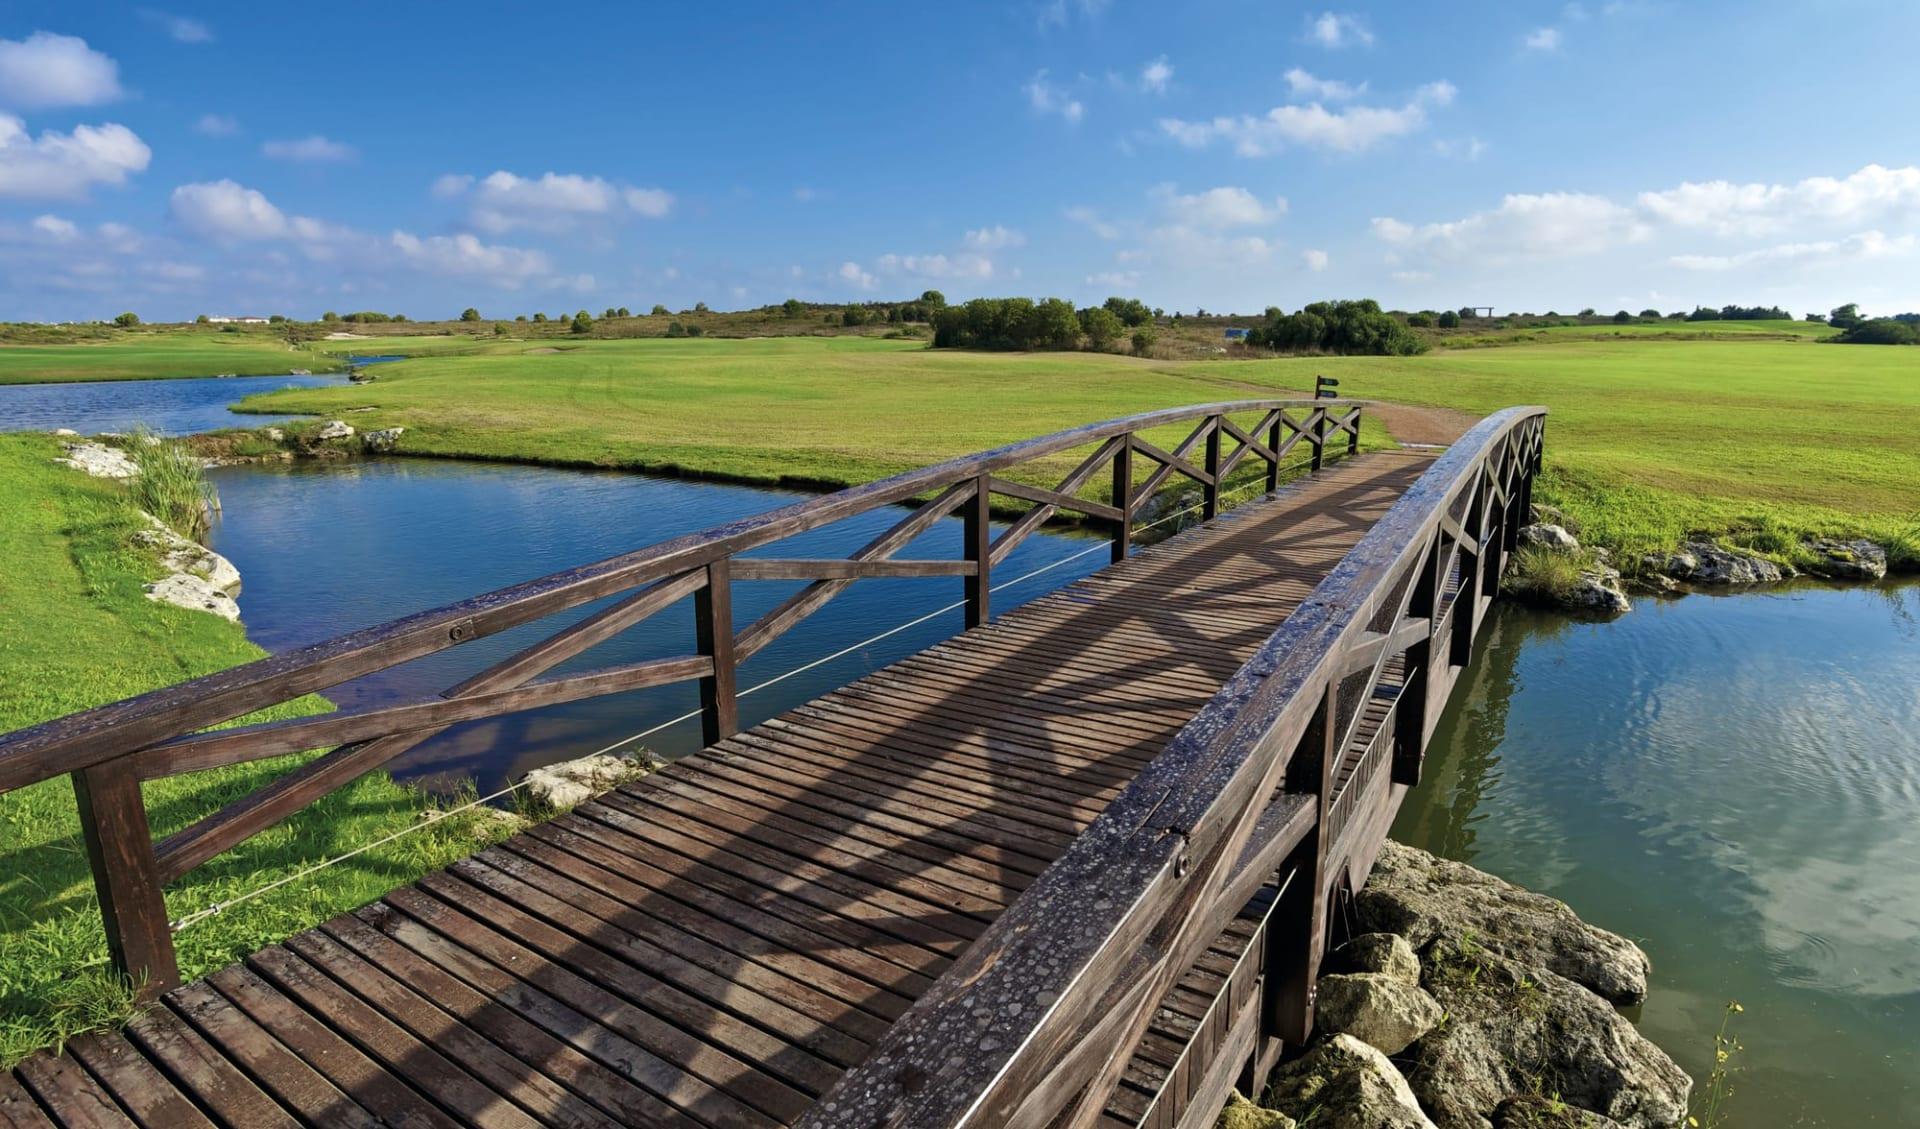 17.04. - 24.04.2022 Golf & Kultur in Apulien ab Brindisi: Acaya-Golf-Resort_Golf_Bridge_IAGTO